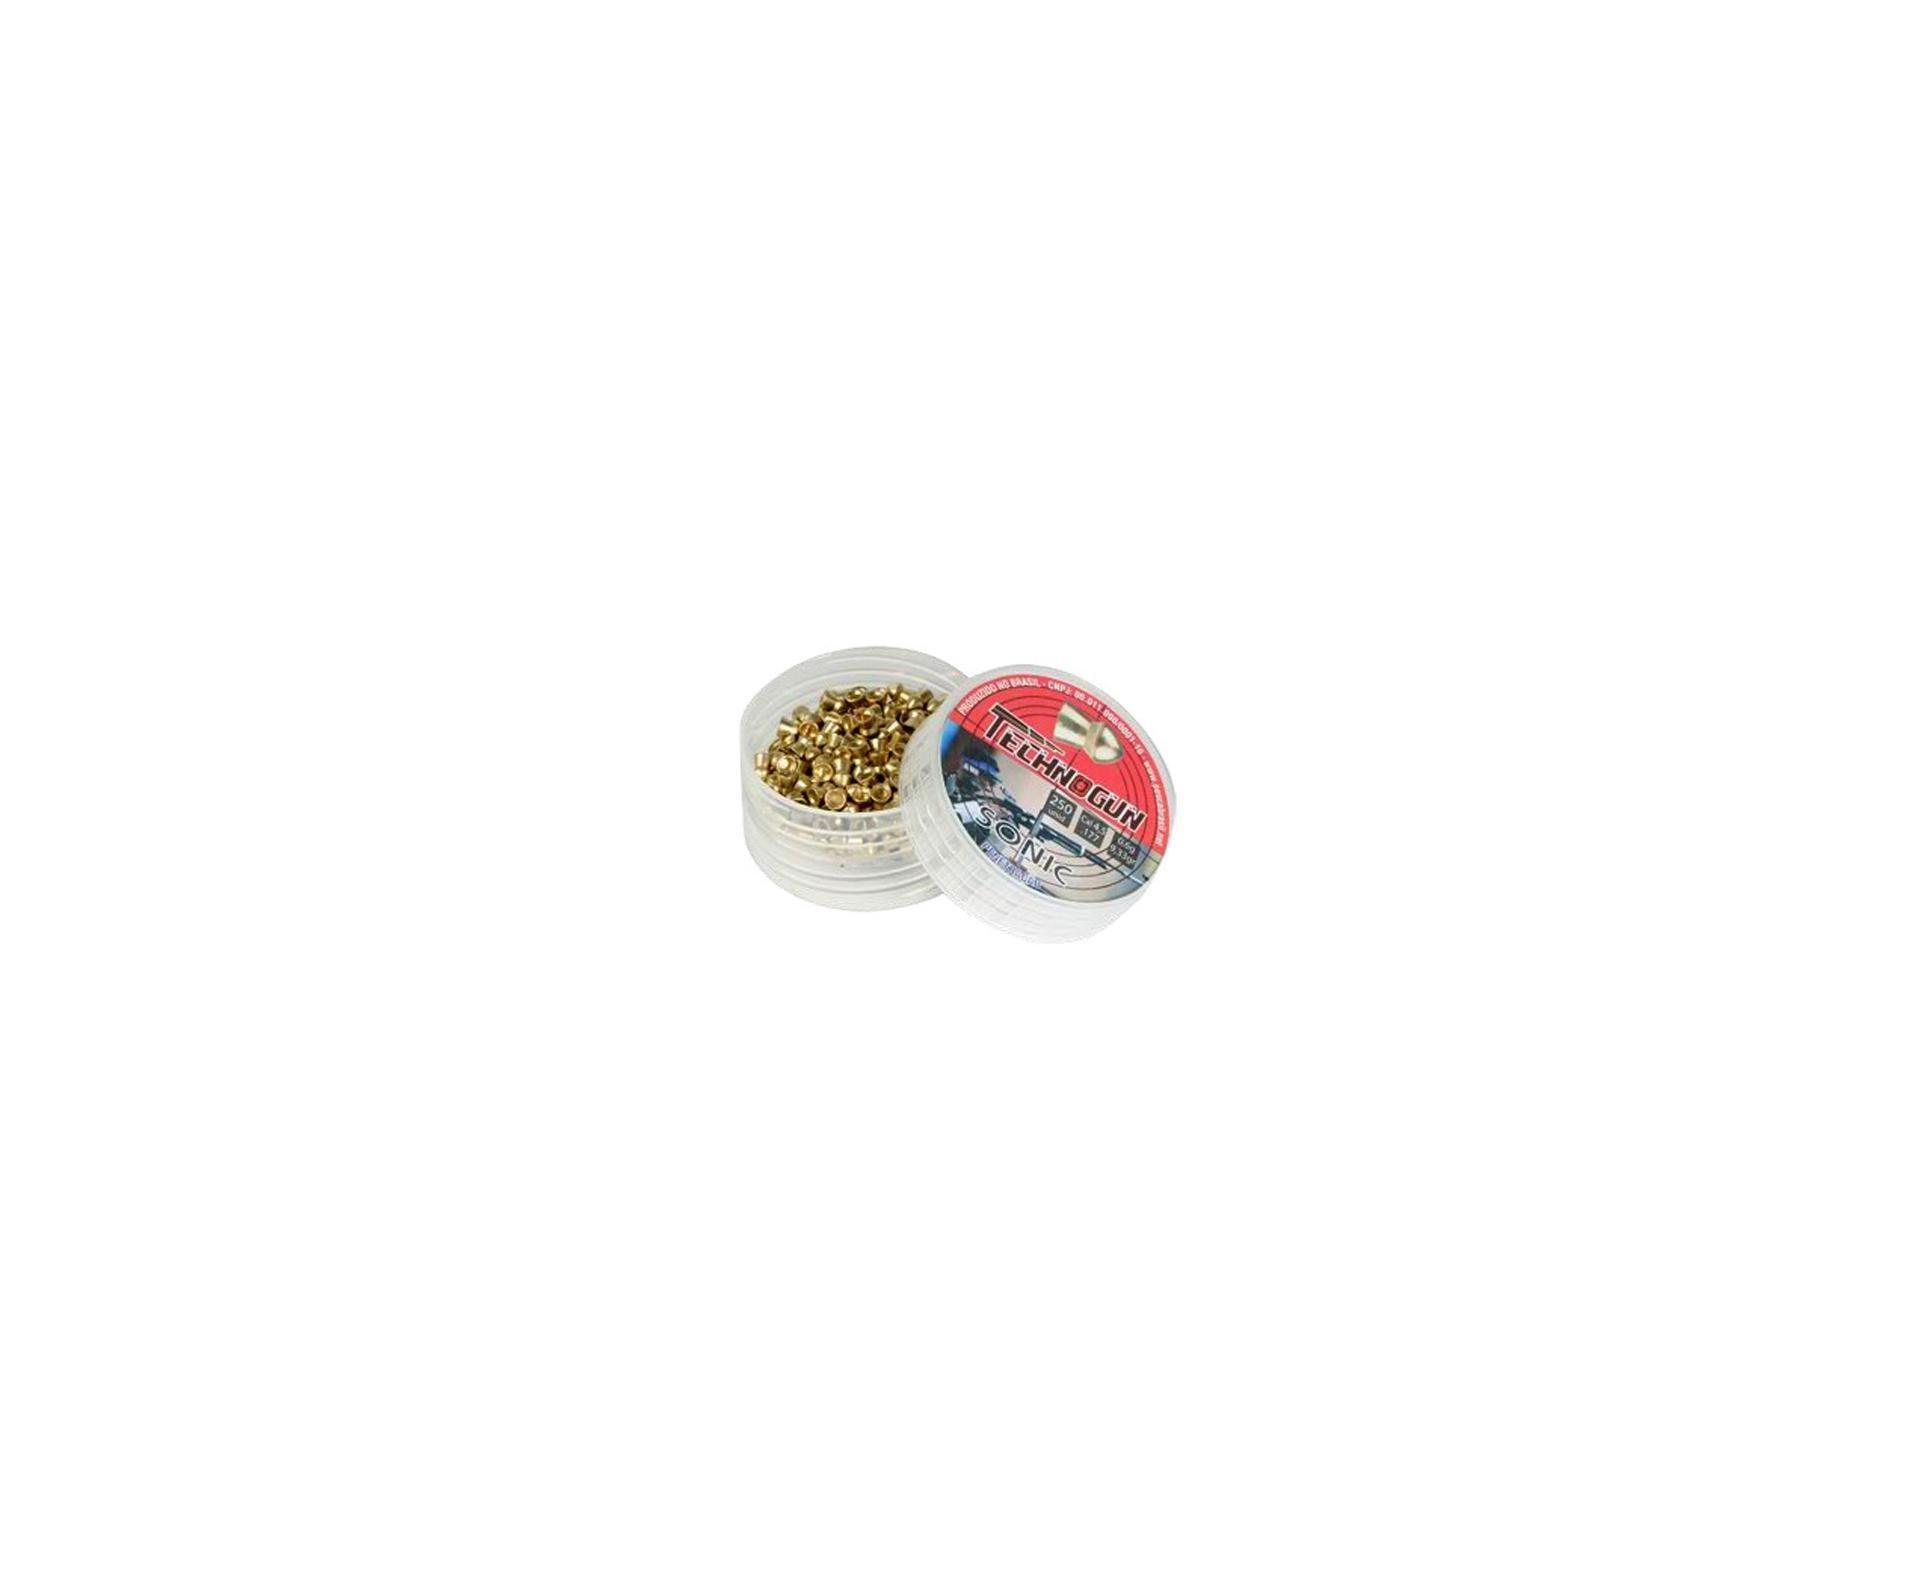 Chumbinho Sonic Gold Latonado Calibre 4,5 Mm - 250 Unidades - Technogun